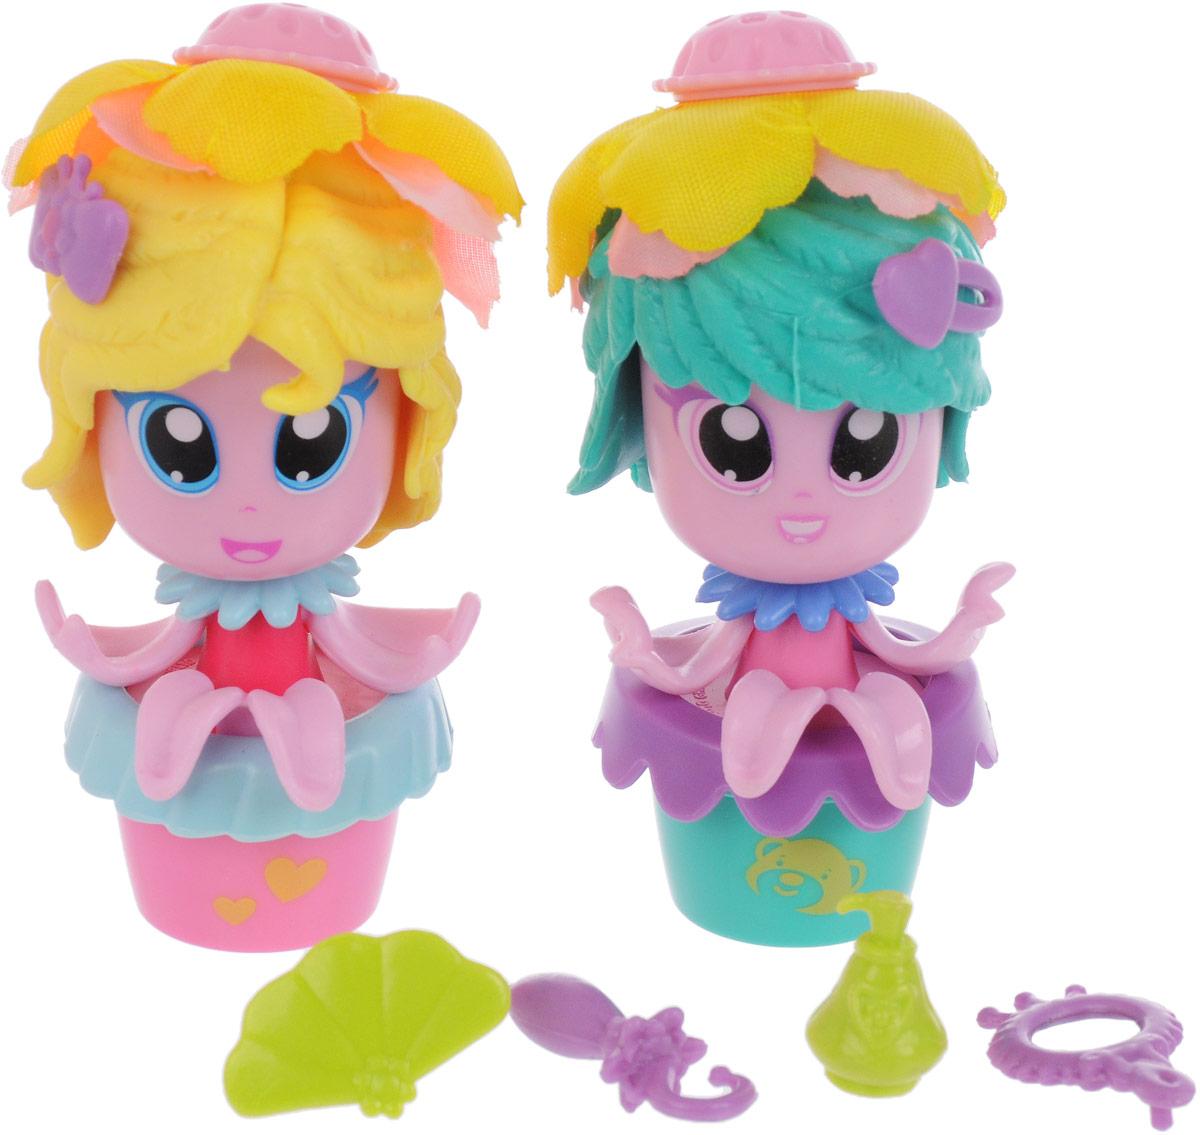 Daisy Набор мини-кукол Цветочек 2 шт